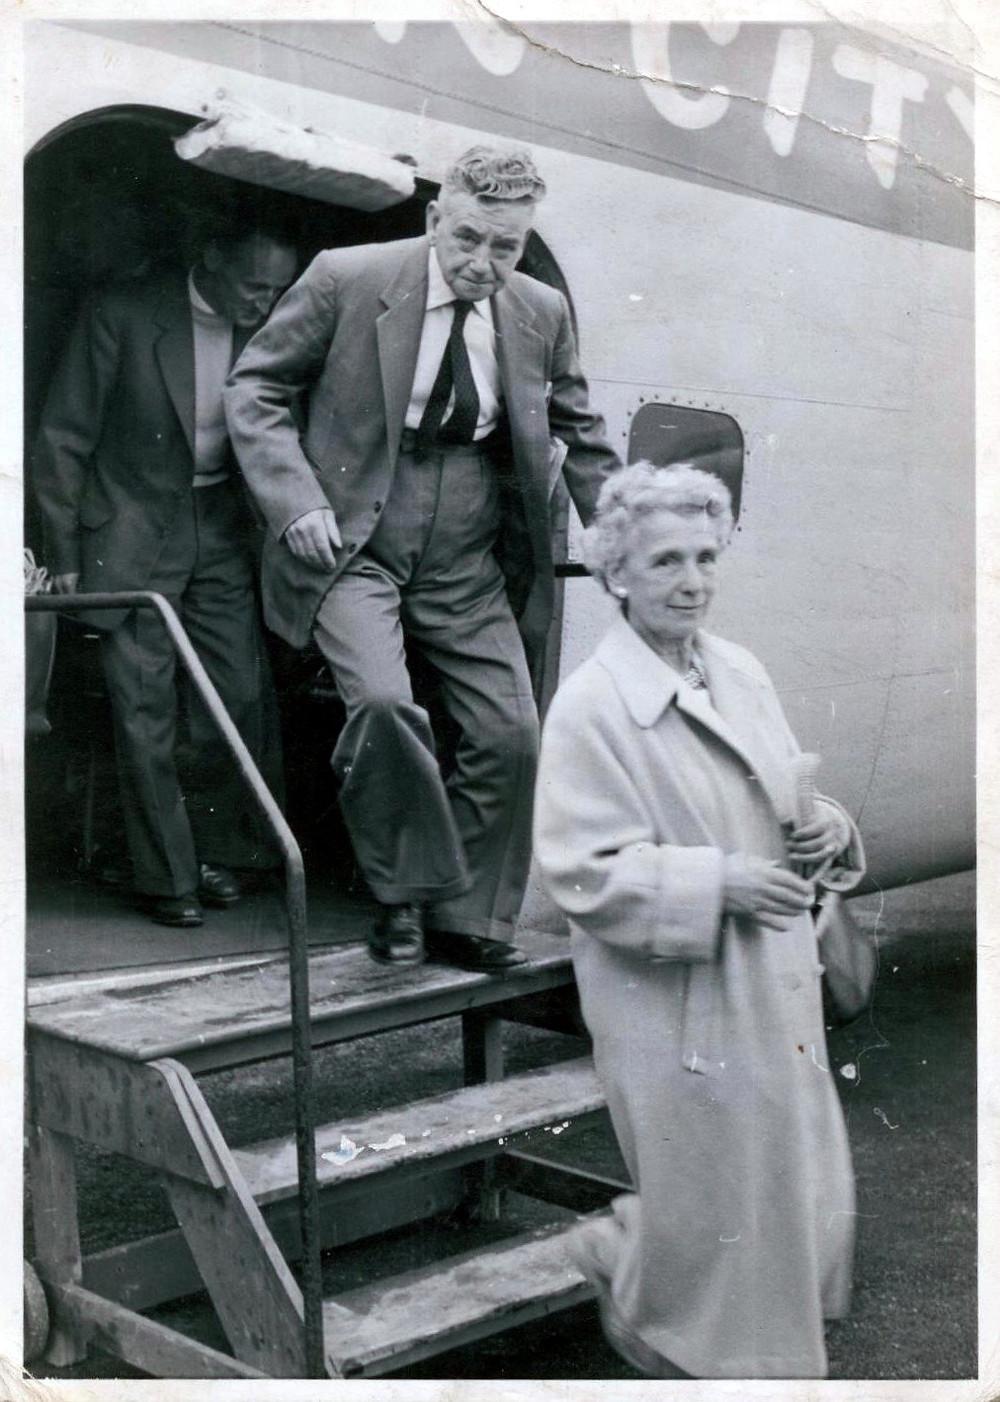 Dad's parents after a joy-ride flight around Blackpool